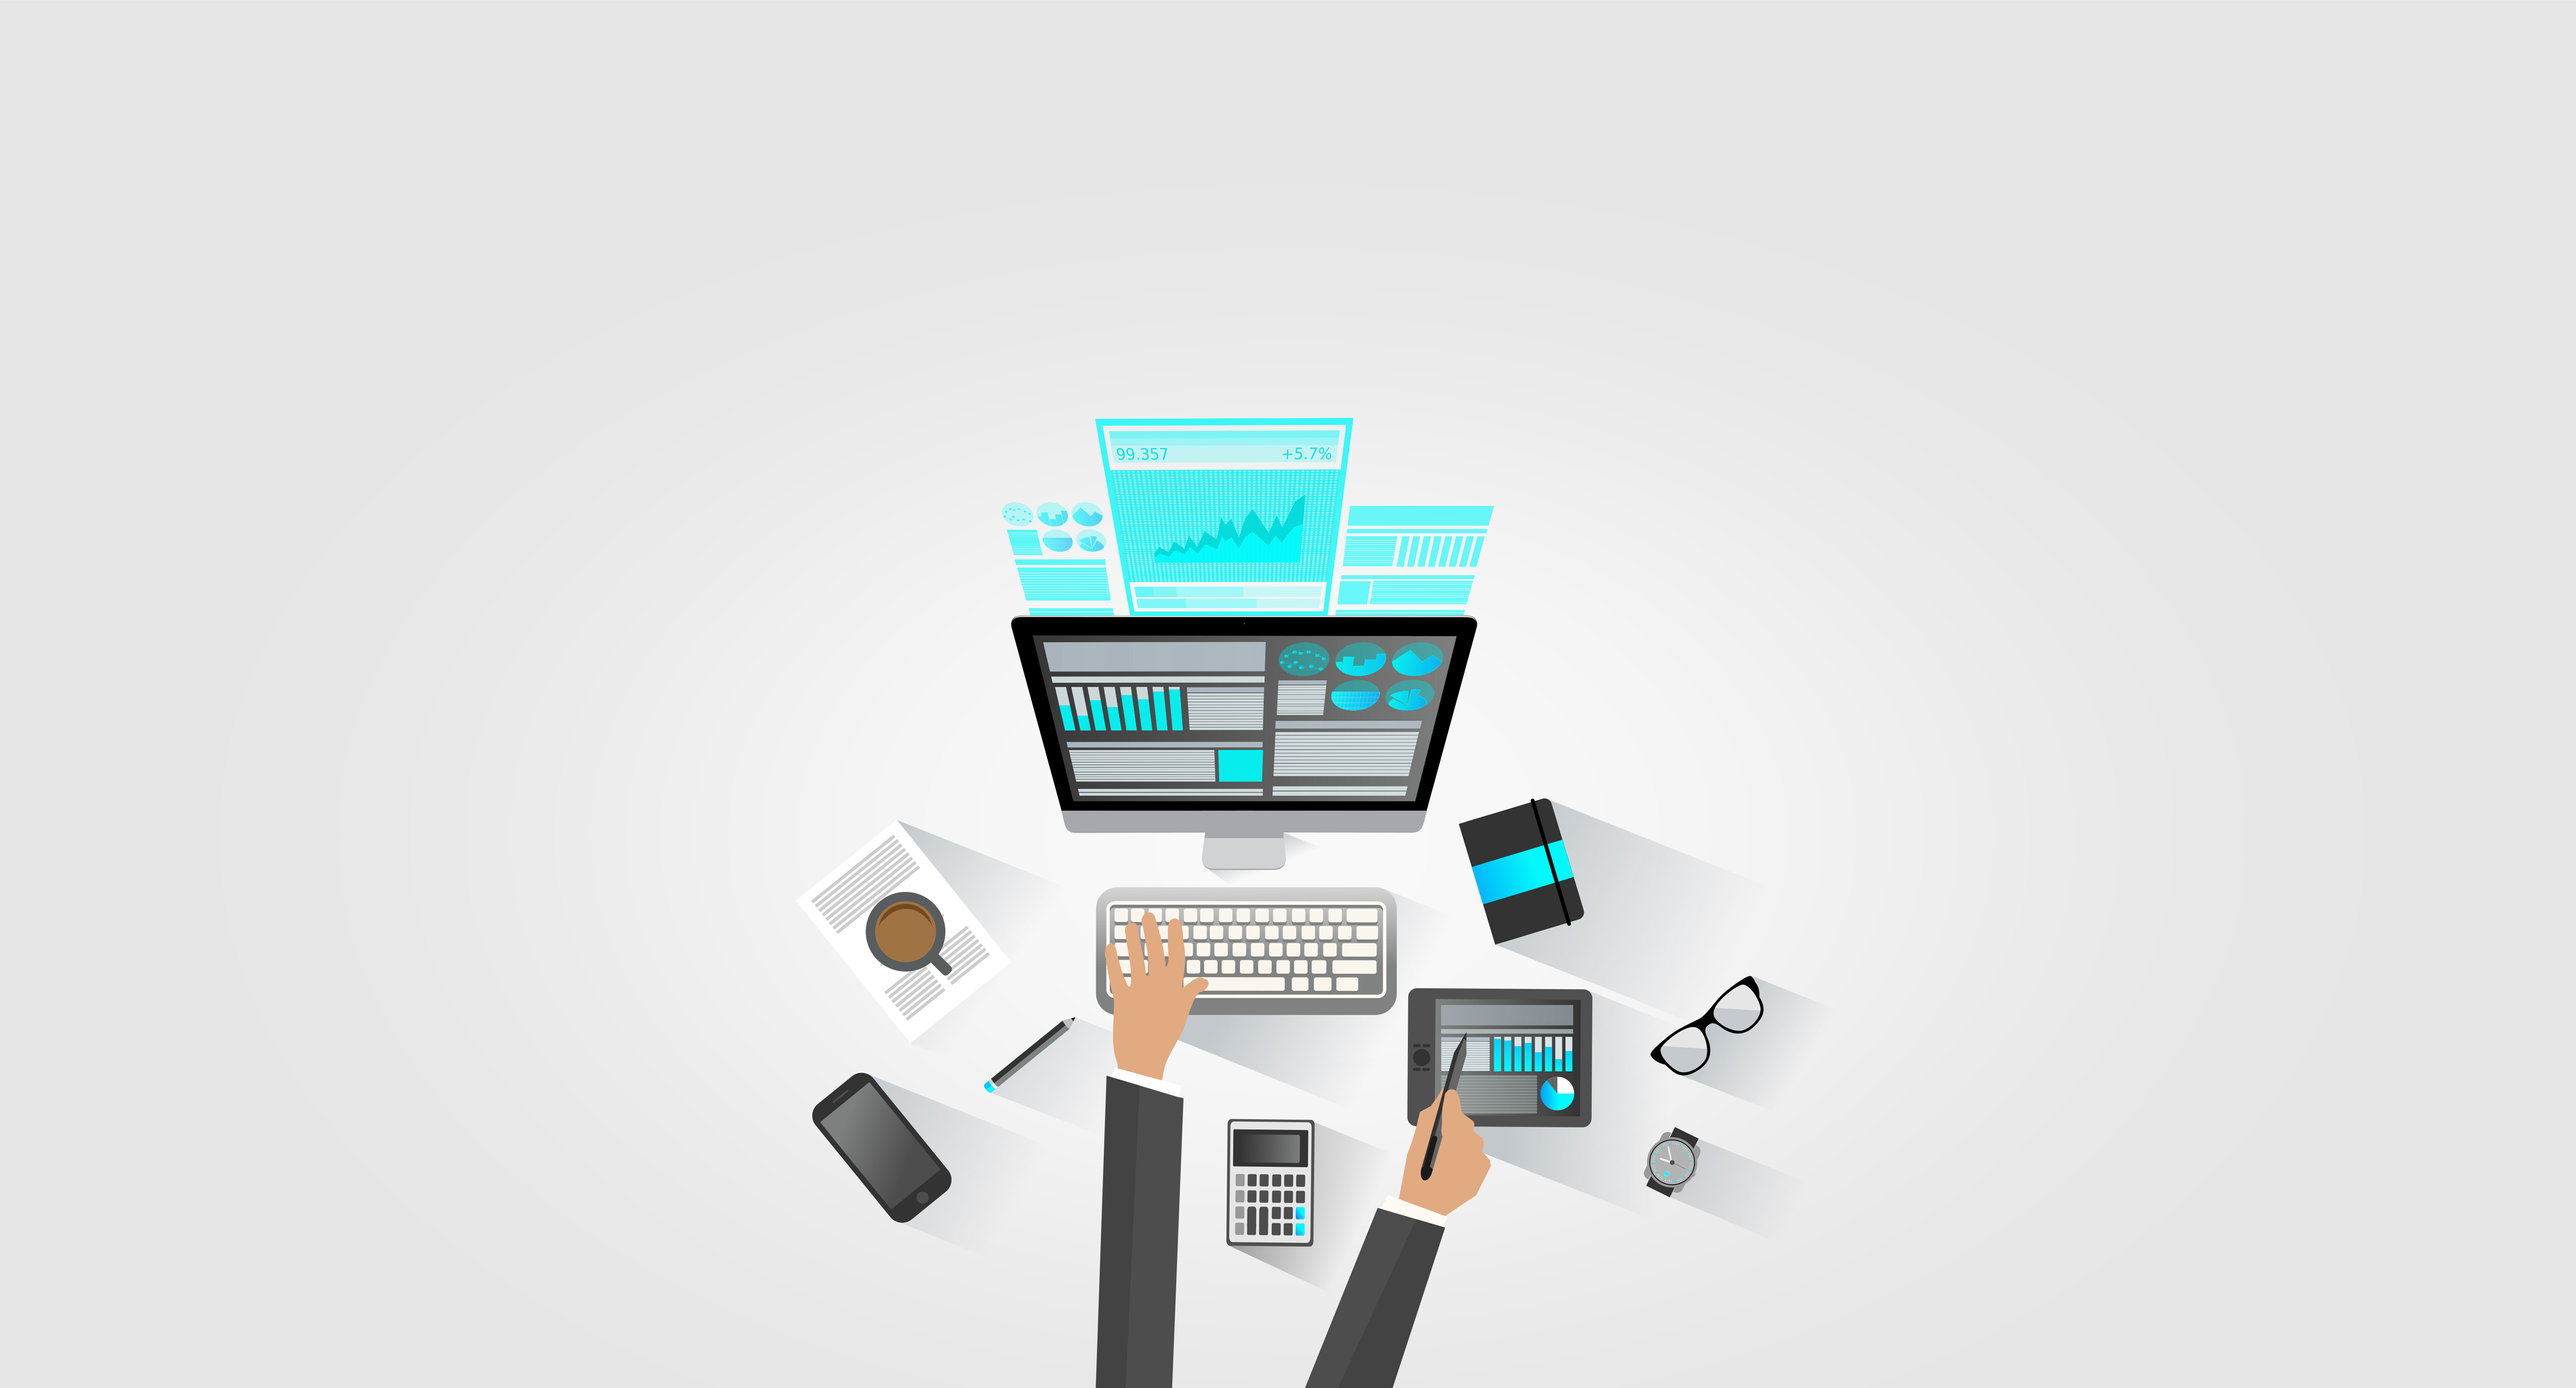 Finance Professional - Broker - Financial Advisor, Account, Laptop, Network, Money, HQ Photo